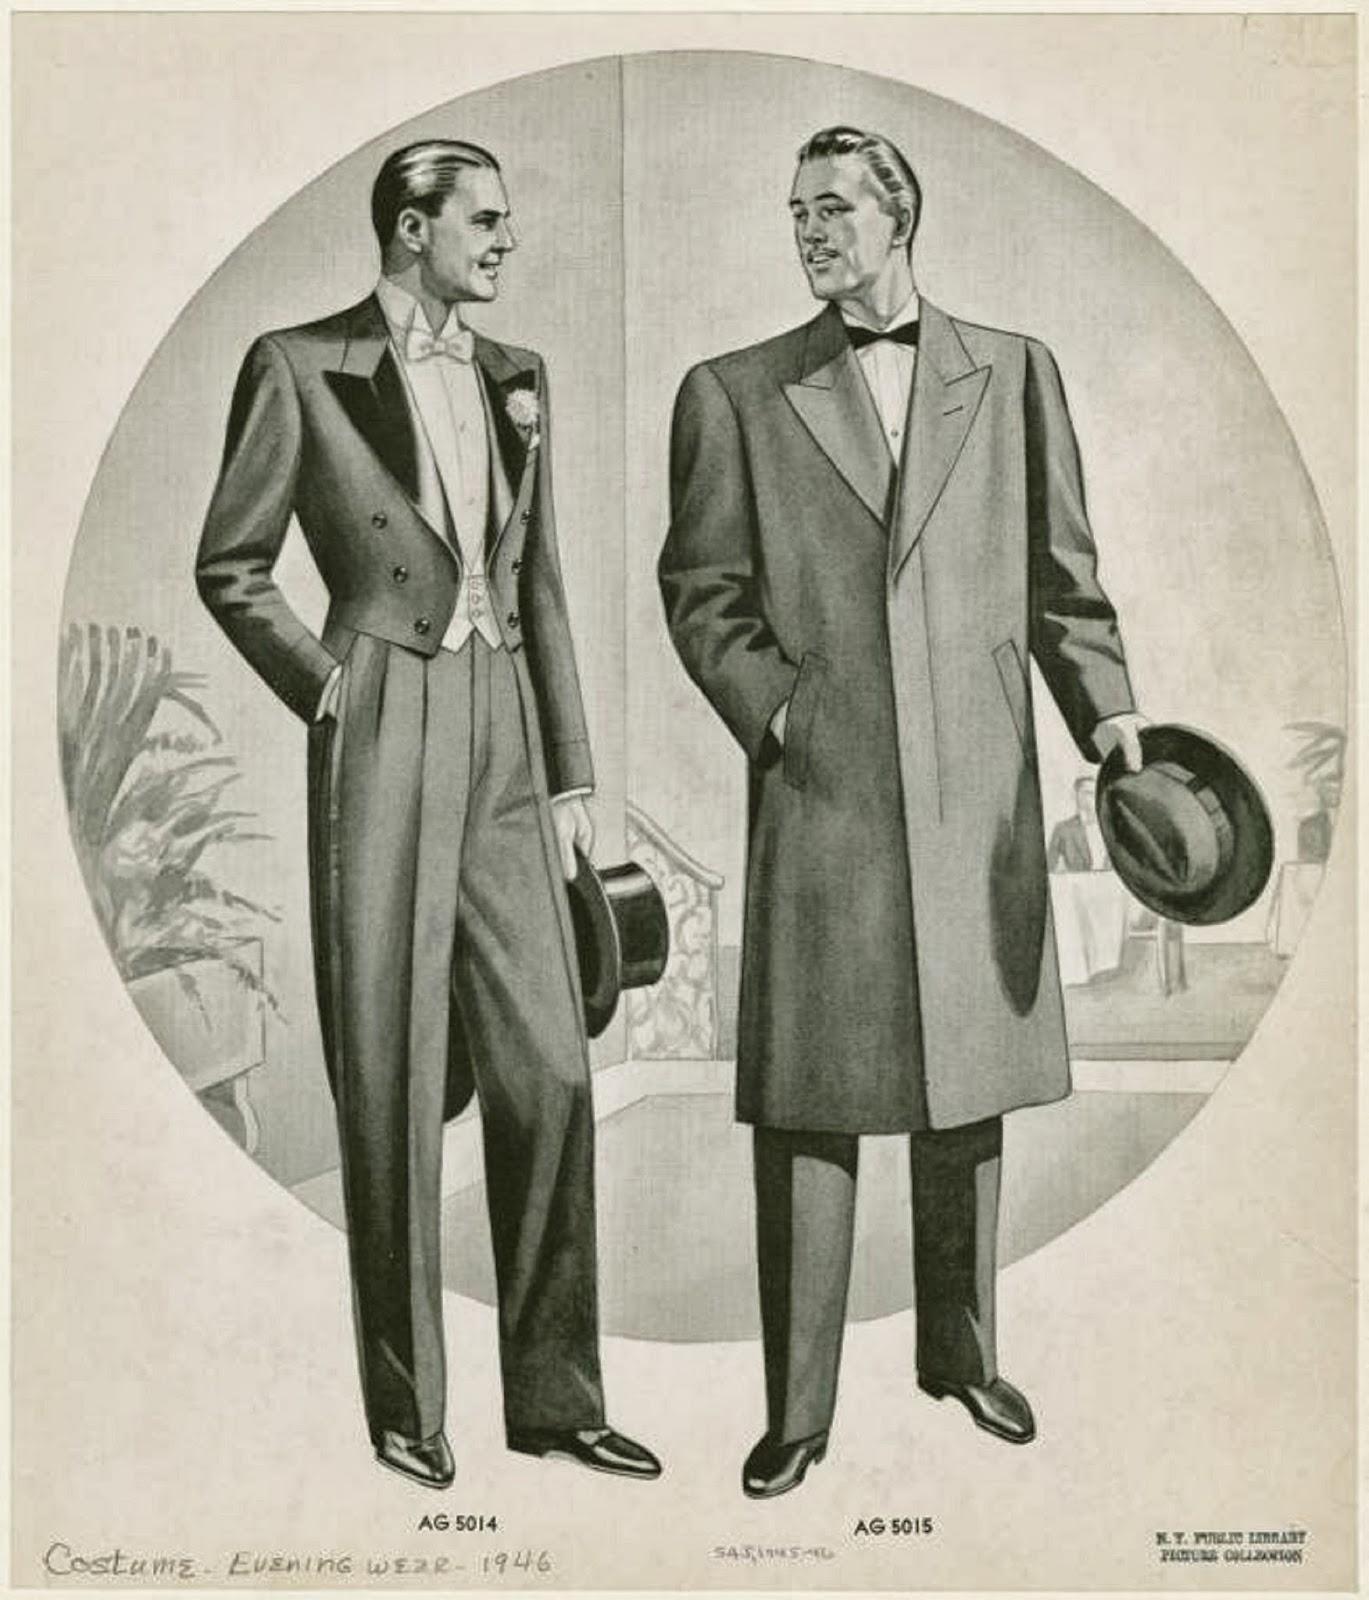 Men's evening wear,1946